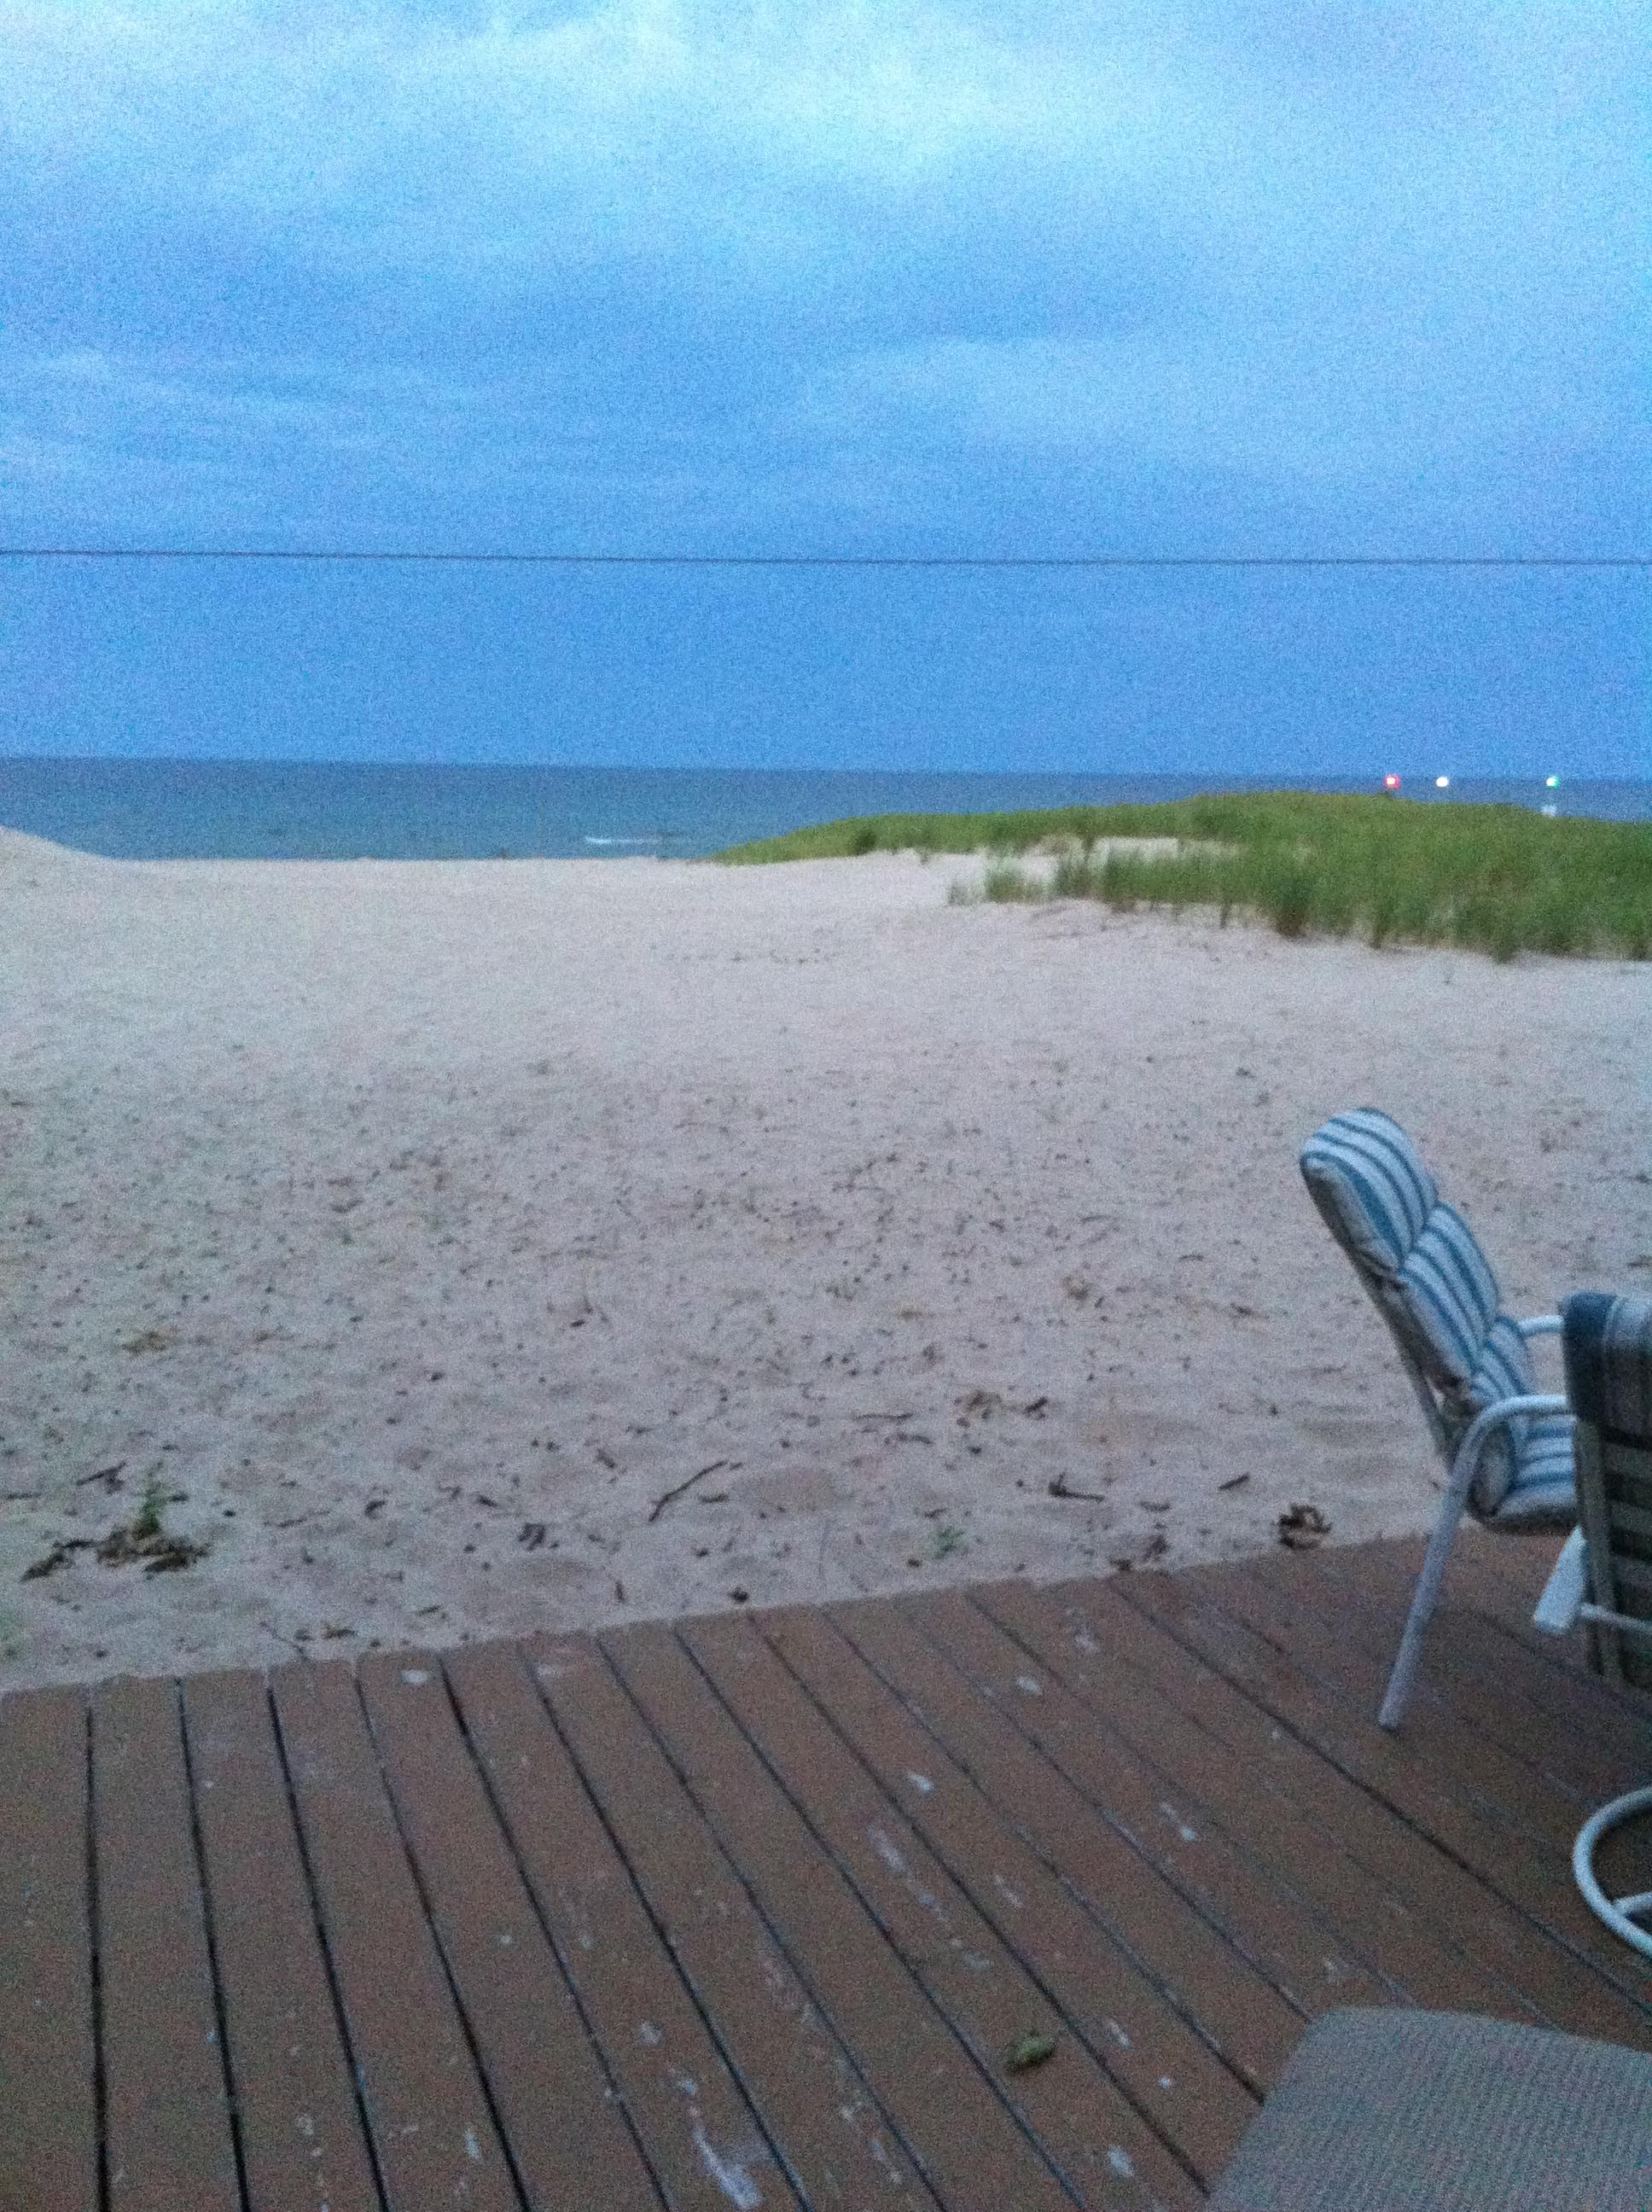 Just before sunrise on Lake Michigan